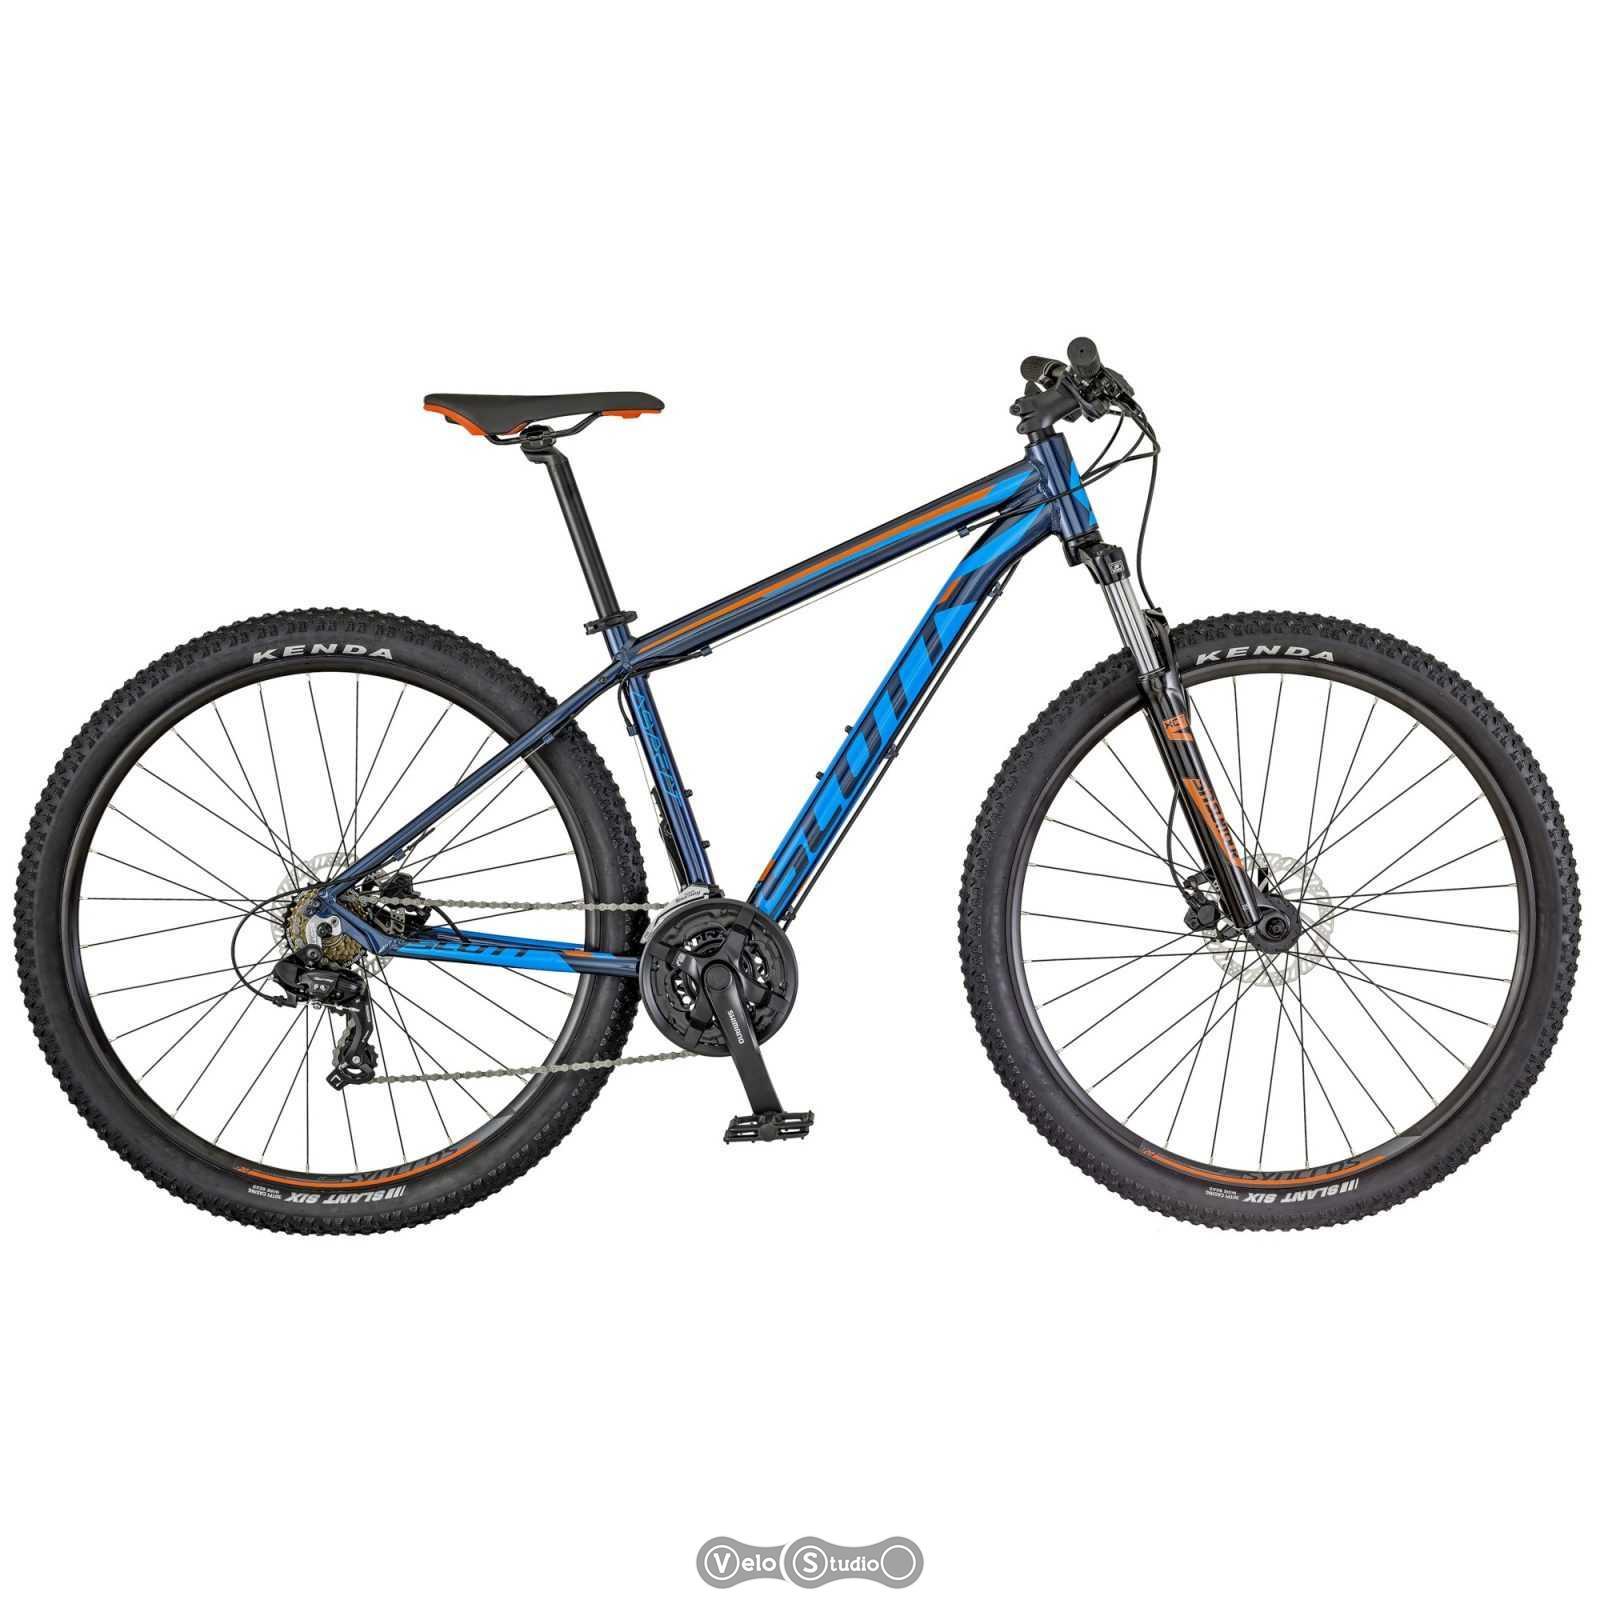 Scott Aspect 760 модель 2018 года 27,5 дюймов синий